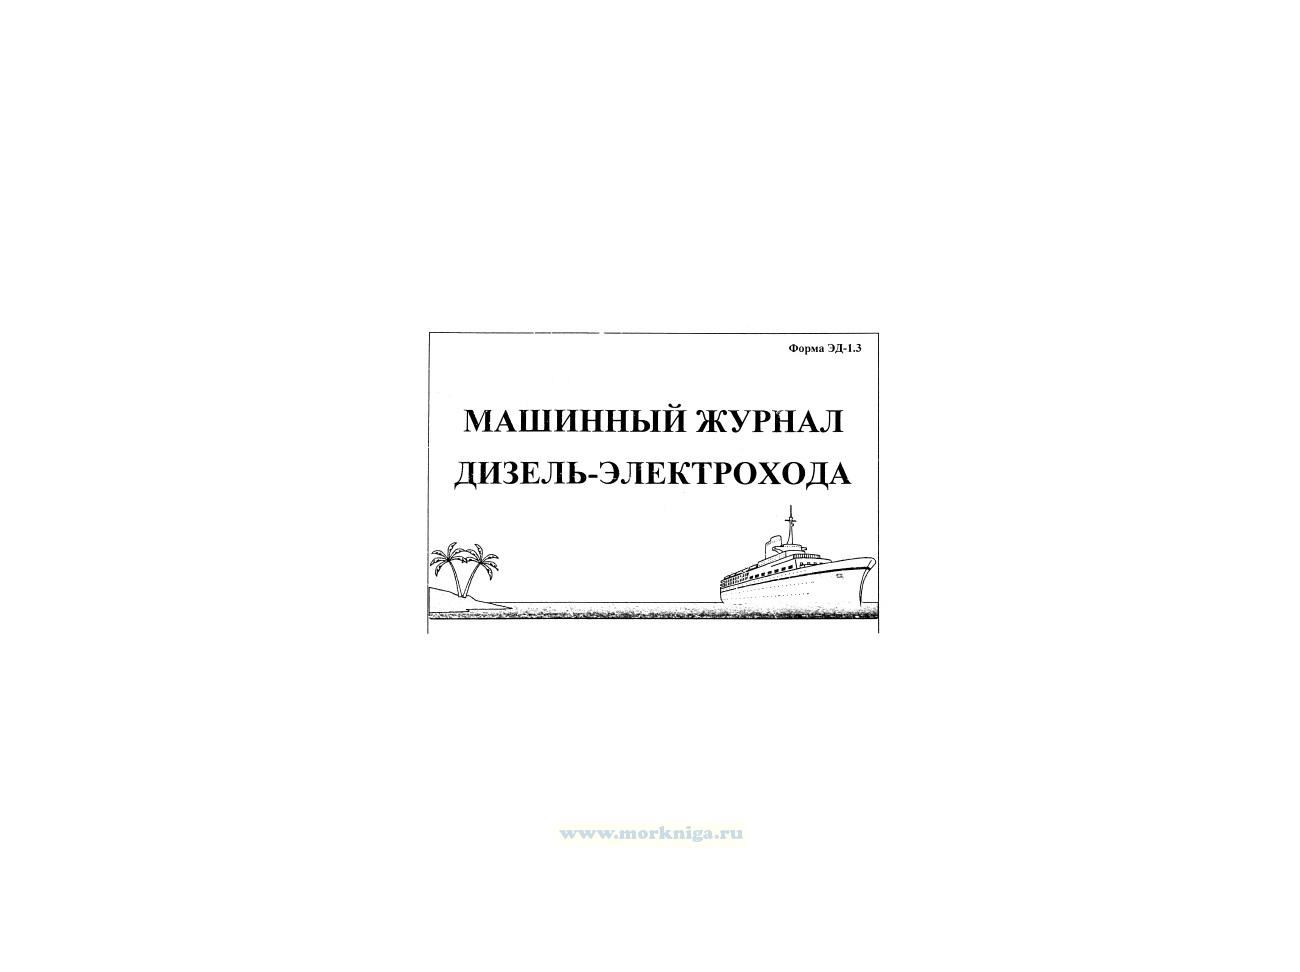 Машинный журнал дизель-электрохода (форма ЭД-1.3)